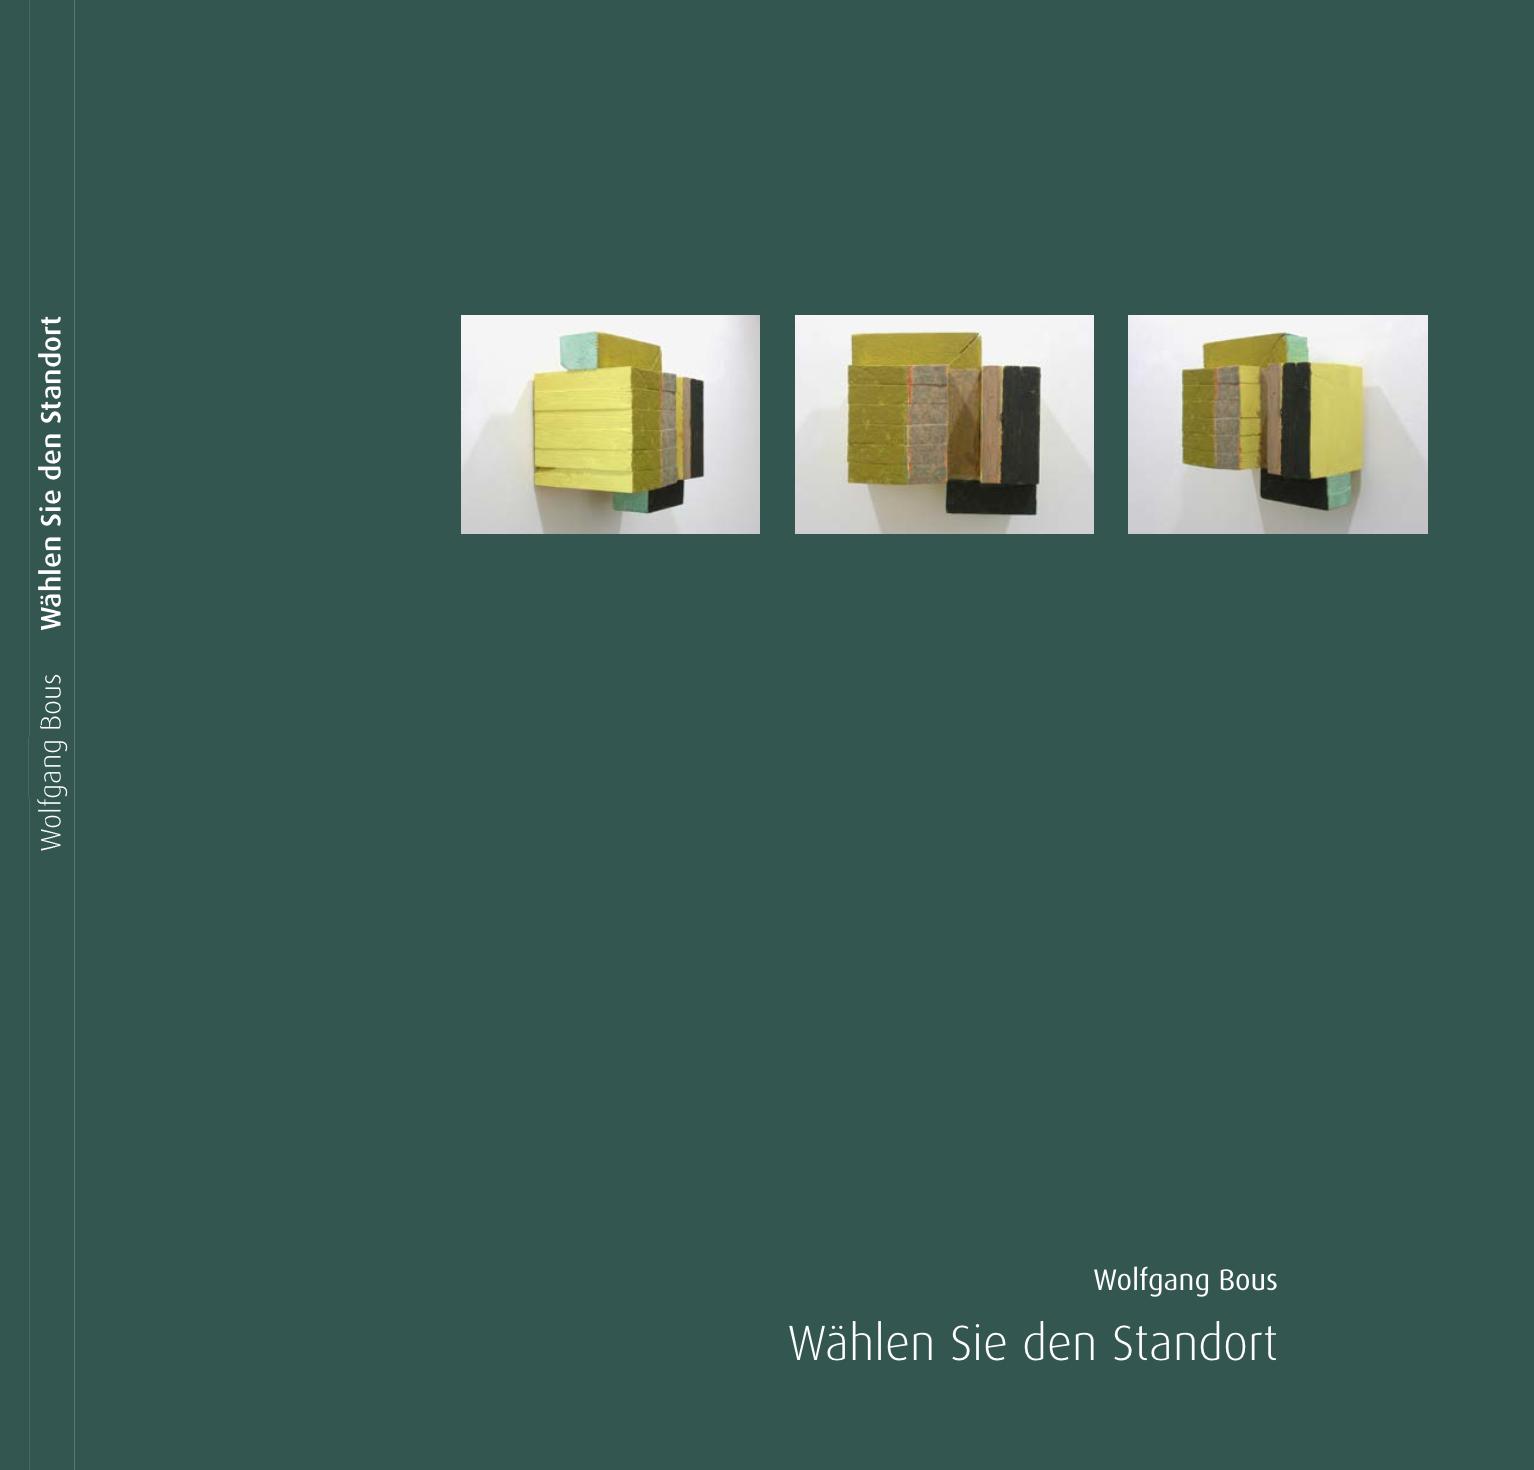 wolfgang bous adkv arbeitsgemeinschaft deutscher kunstvereine. Black Bedroom Furniture Sets. Home Design Ideas